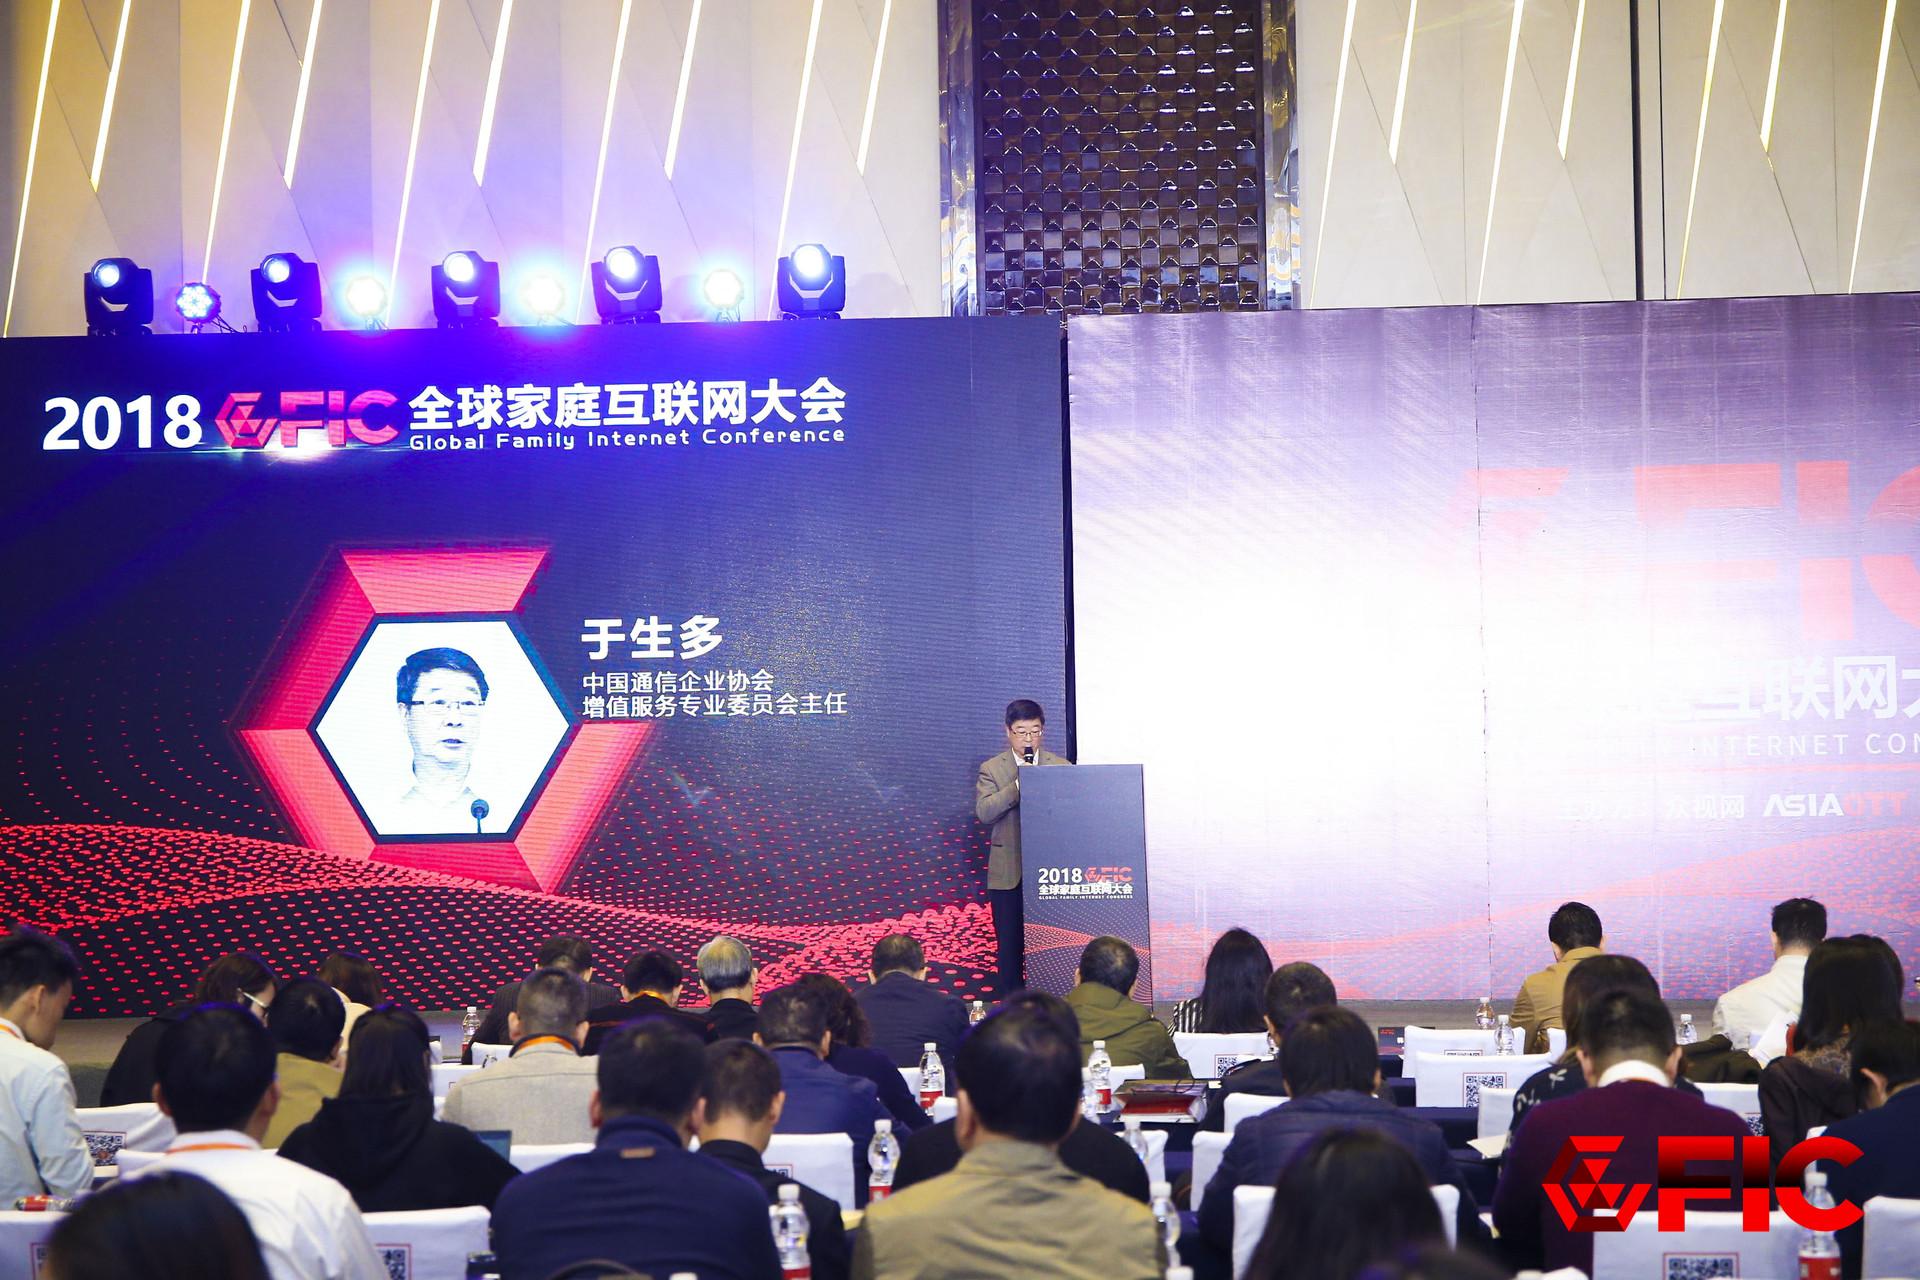 GFIC家庭领袖峰会:中国工程院、总局科技委、爱奇艺、百视通、沃达丰、BT嘉宾观点汇